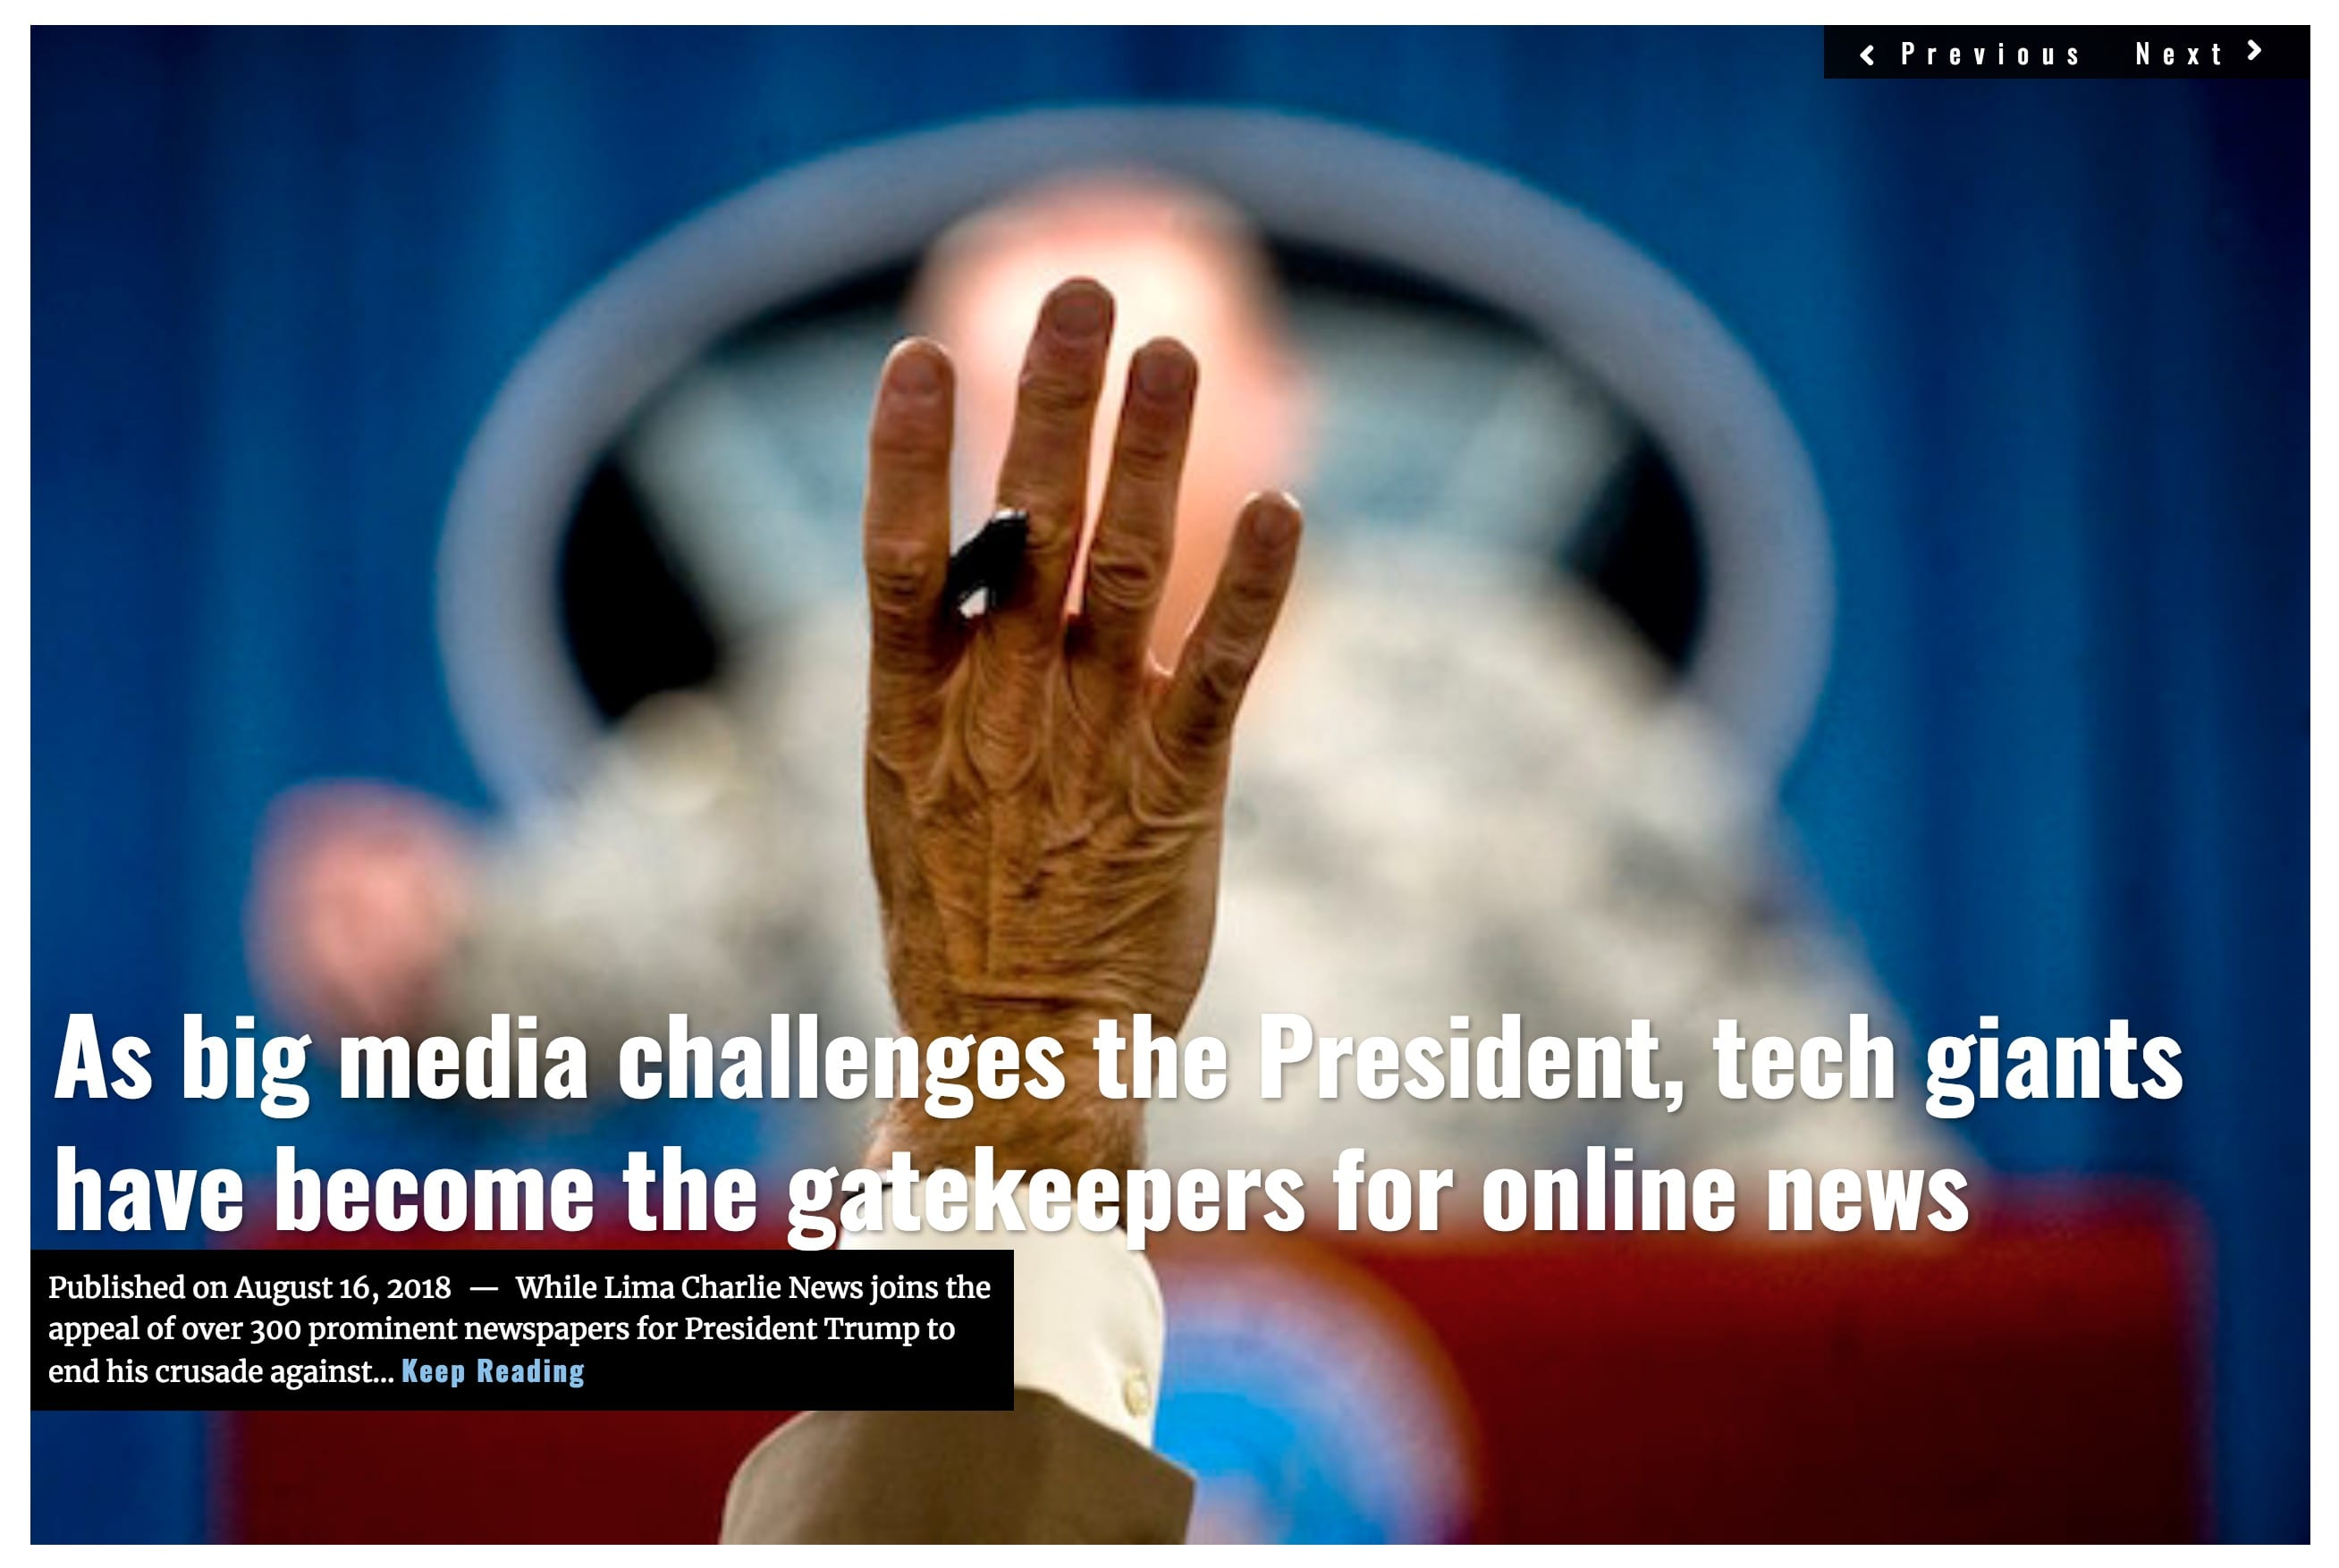 Image Lima Charlie News Headline Fake News Online D.Lynch AUG 16 2018